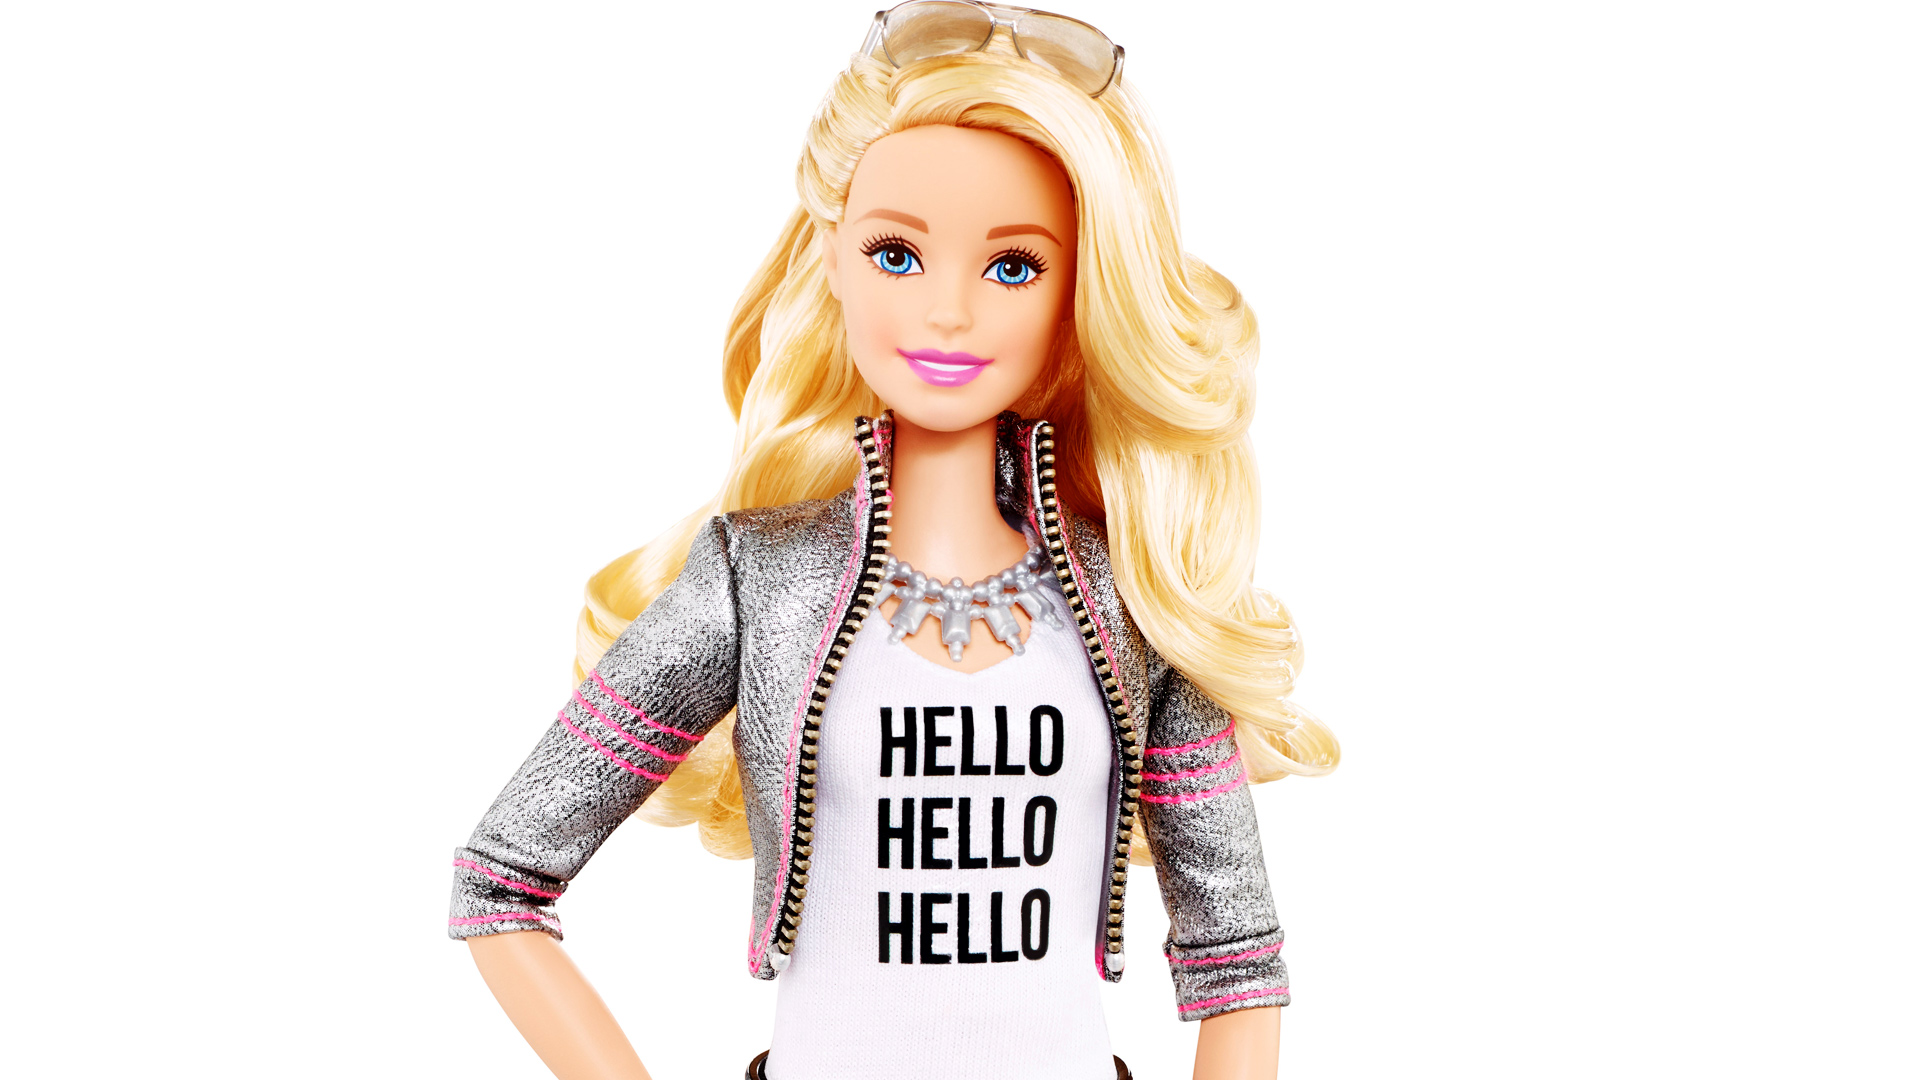 High Resolution Wallpaper | Barbie 1920x1080 px